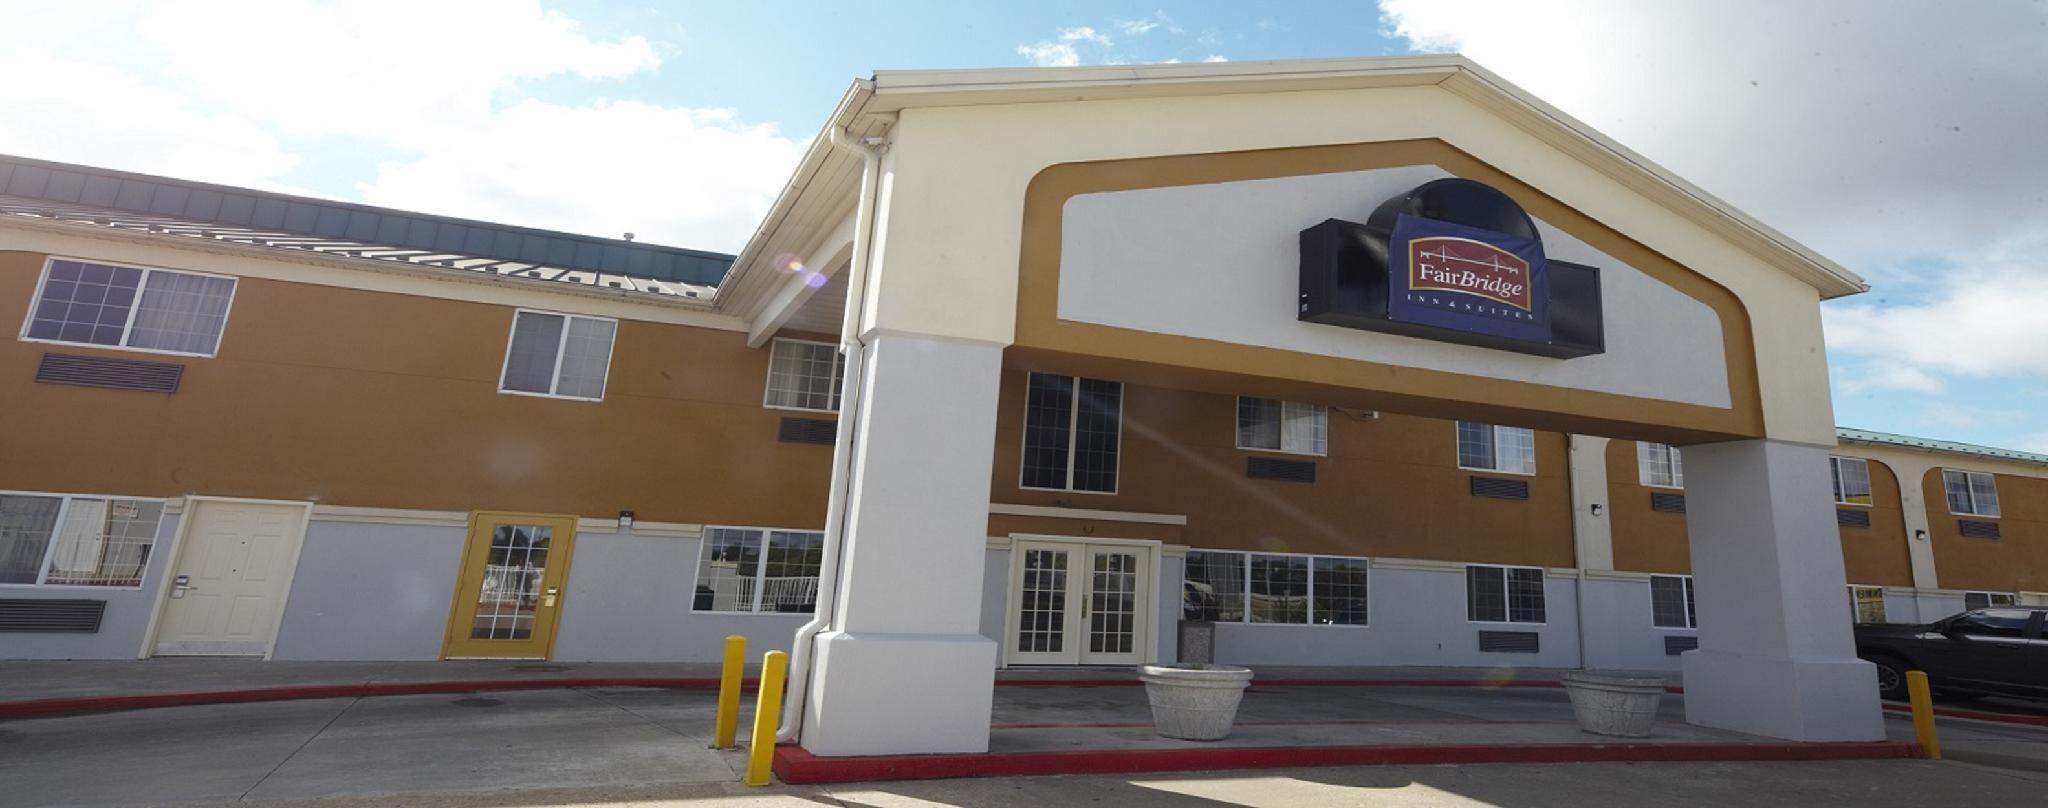 FairBridge Inn And Suites Tulsa Airport And Fairgrounds